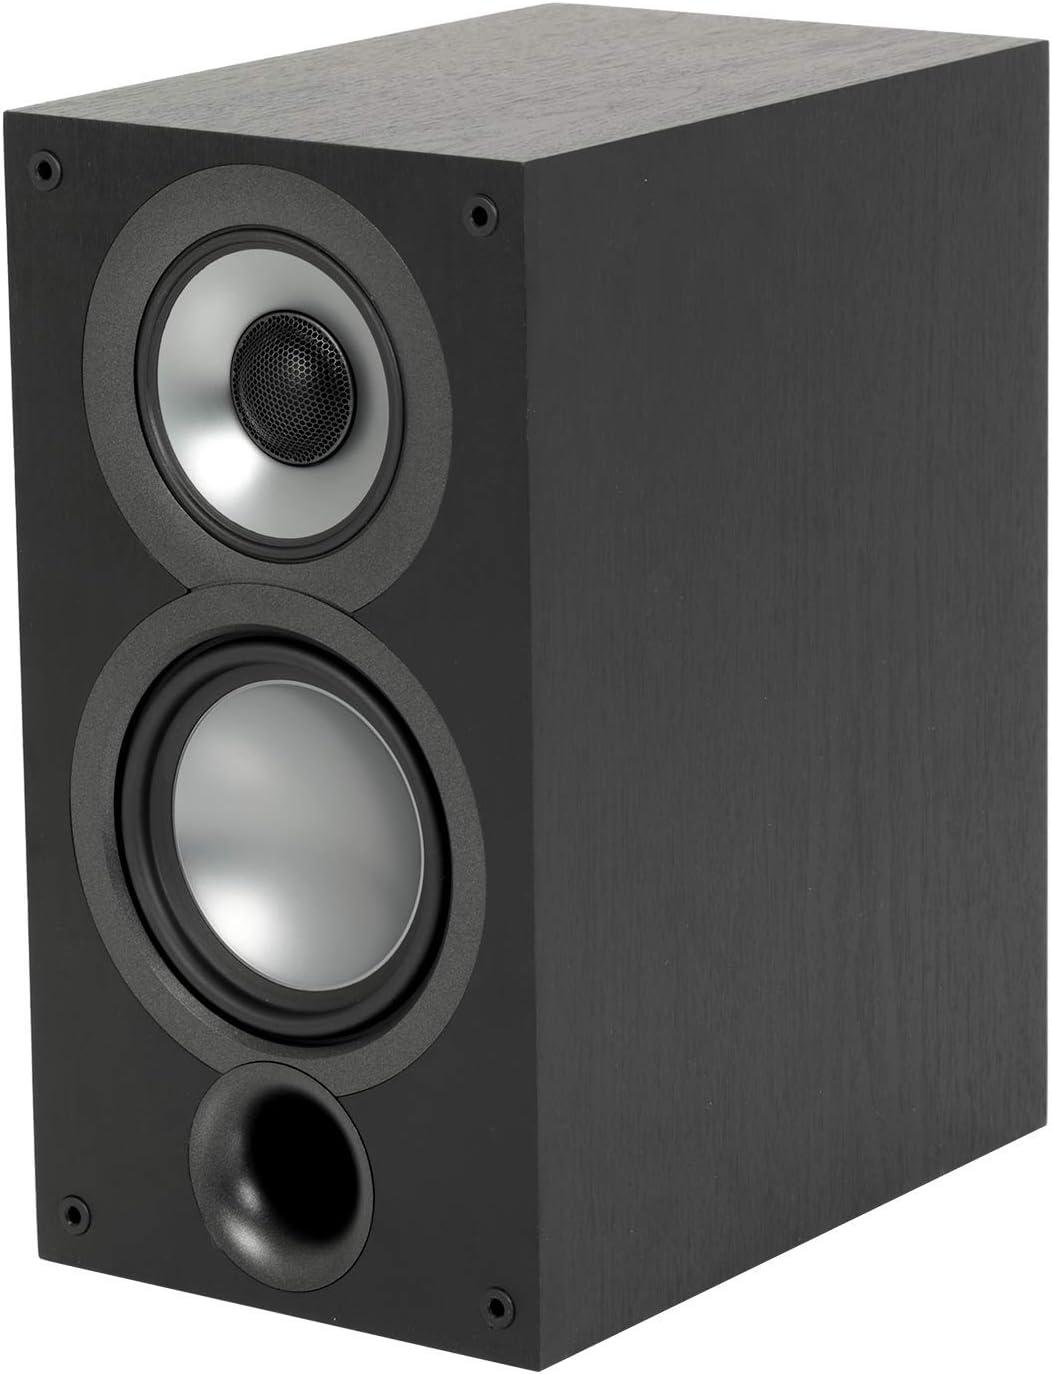 ELAC Uni-Fi 2.0 UB52-High Budget Speakers